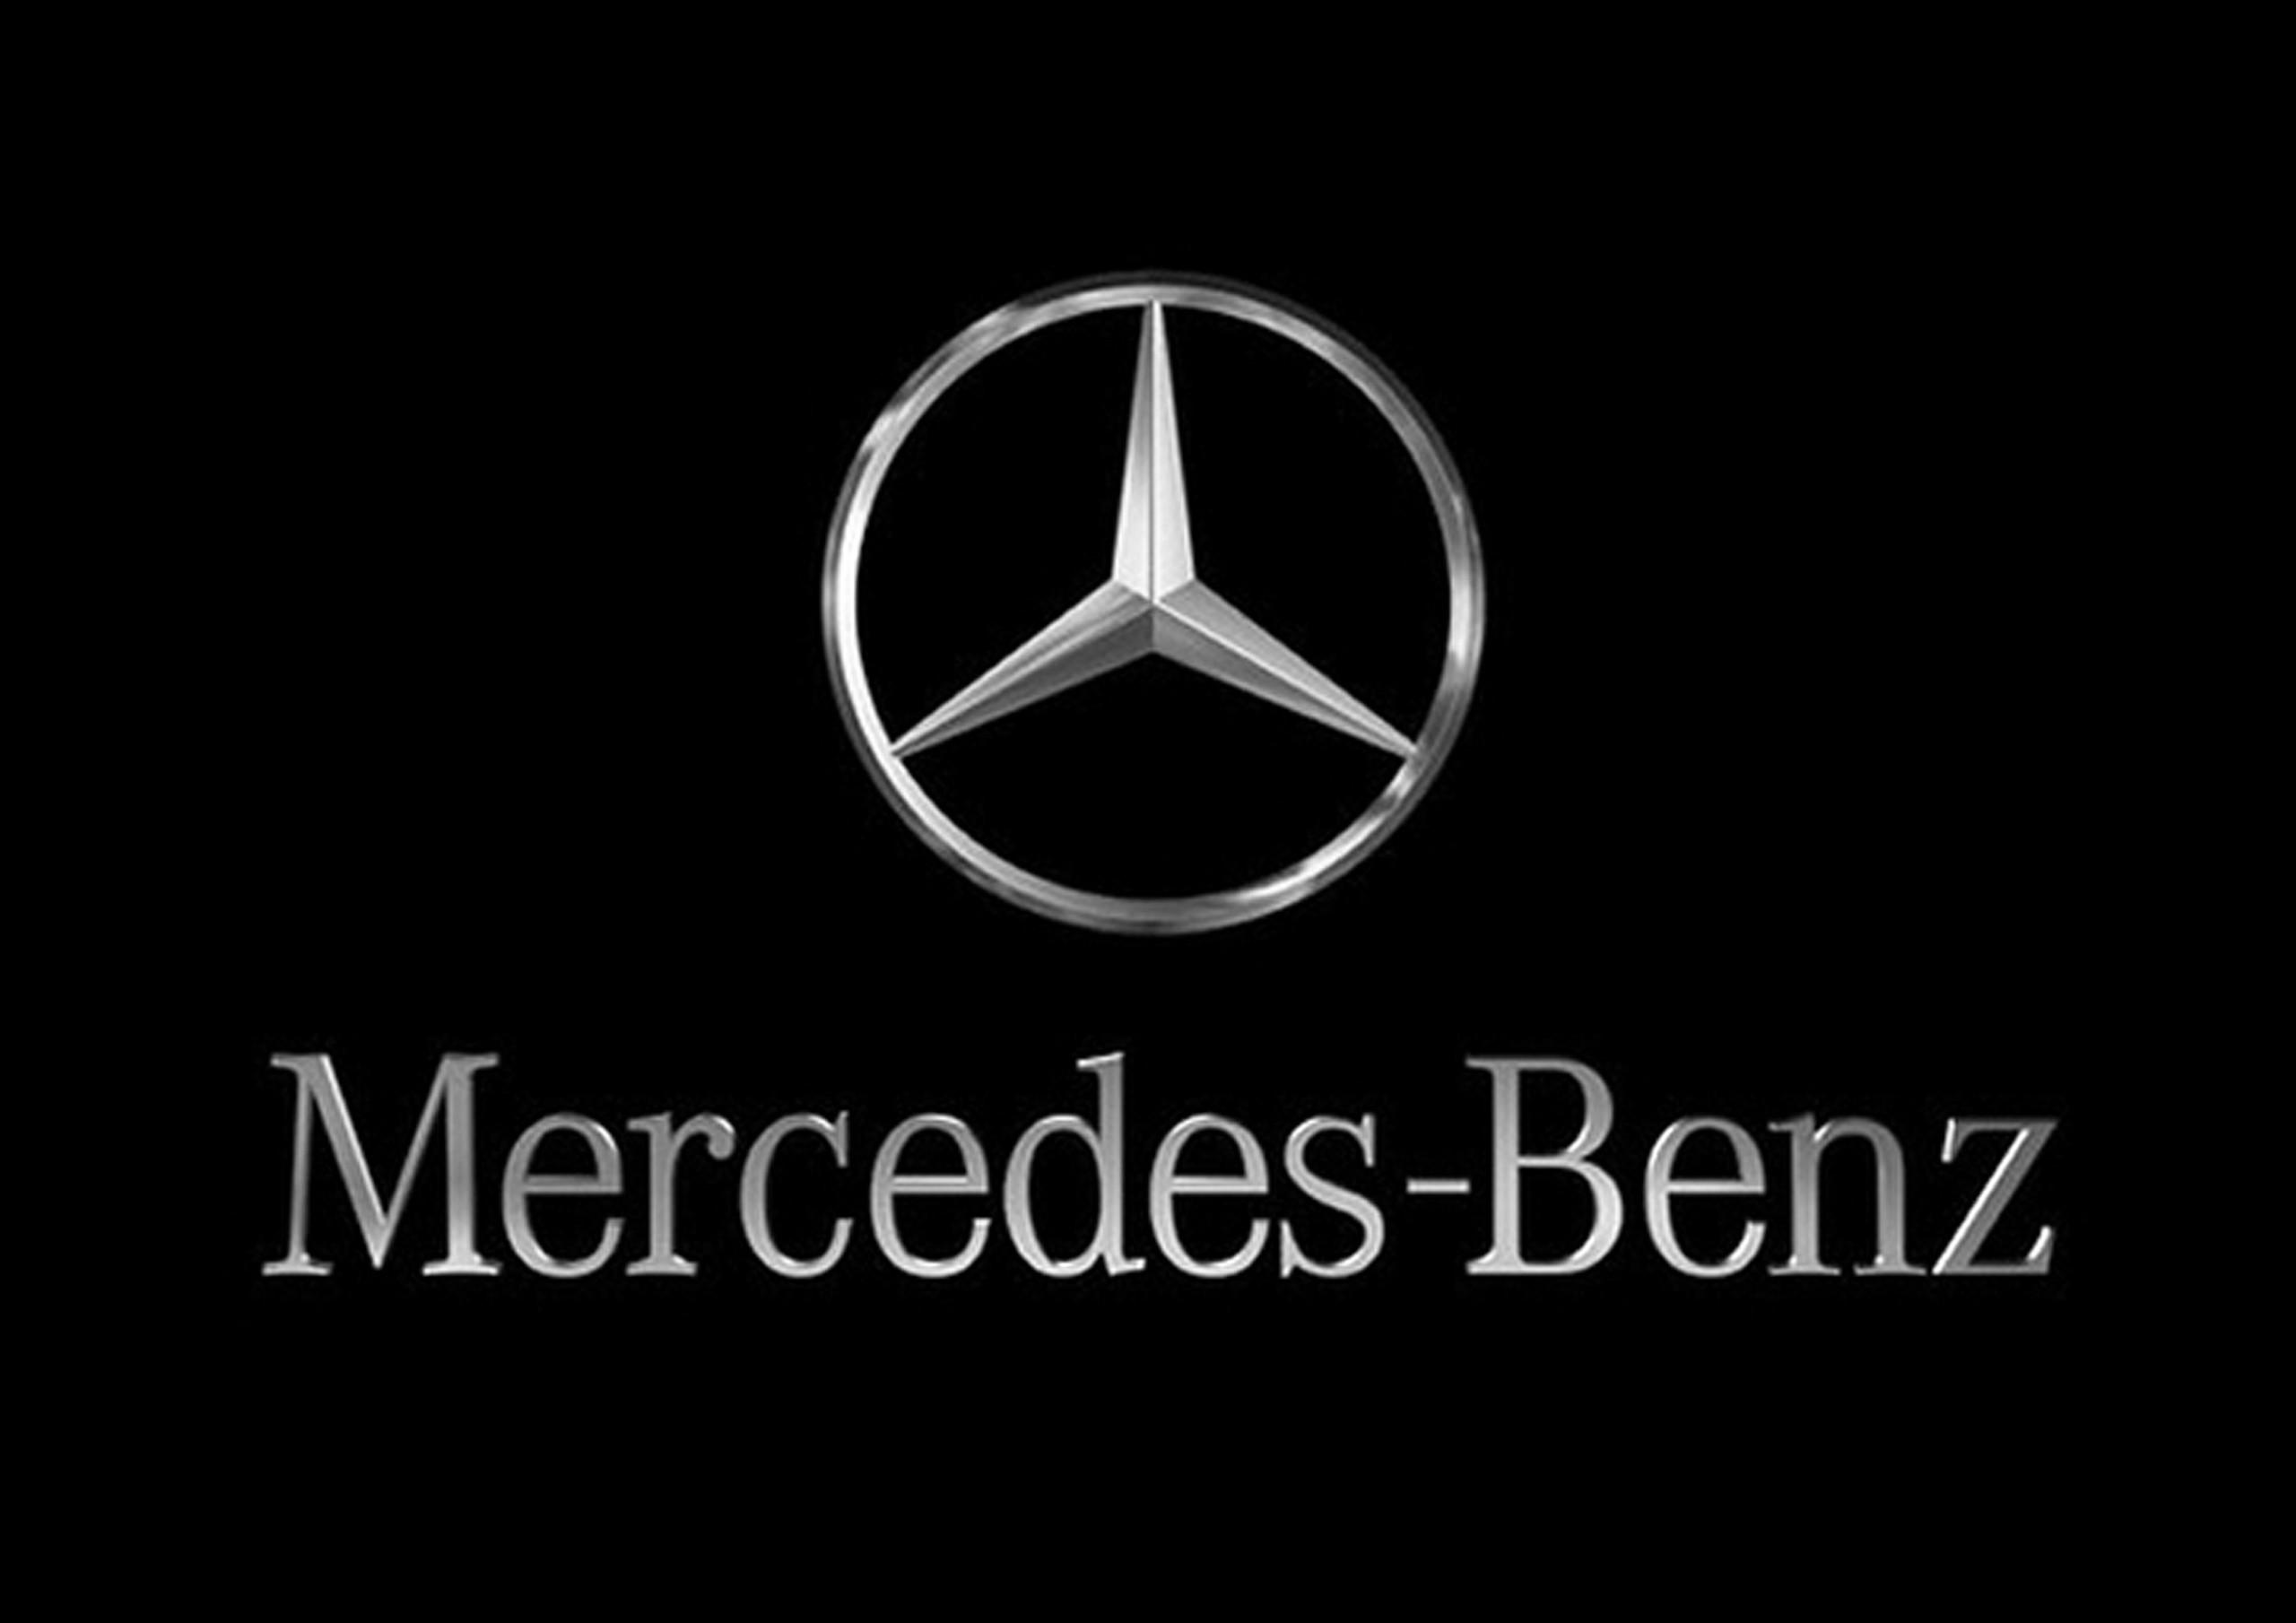 Mercedes Benz Türk